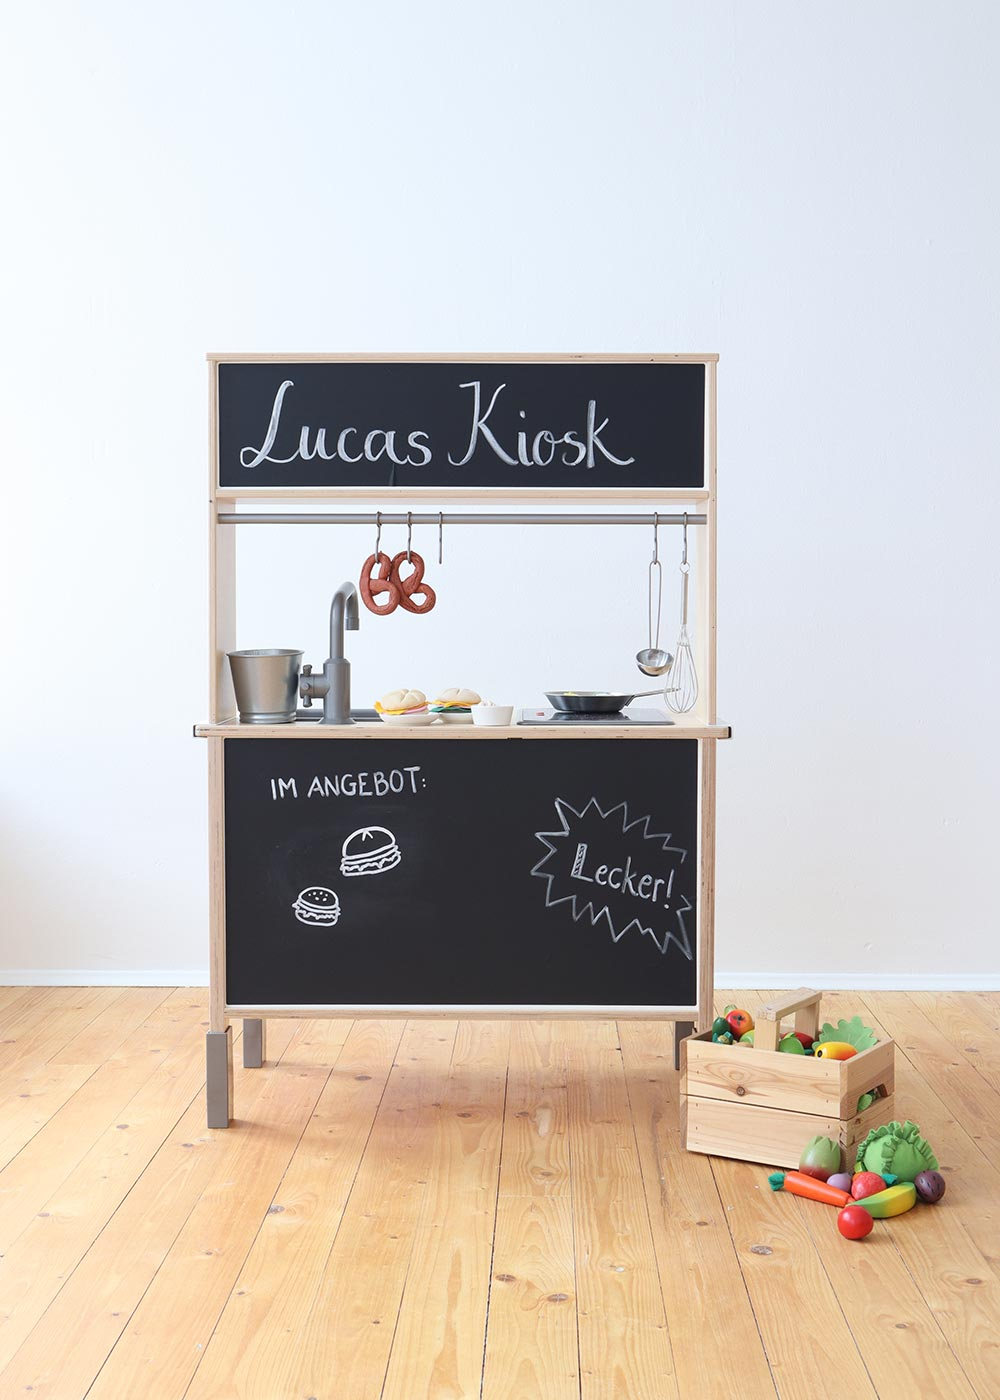 Ikea Duktig Kinderküche Tafelfolie Kreidig